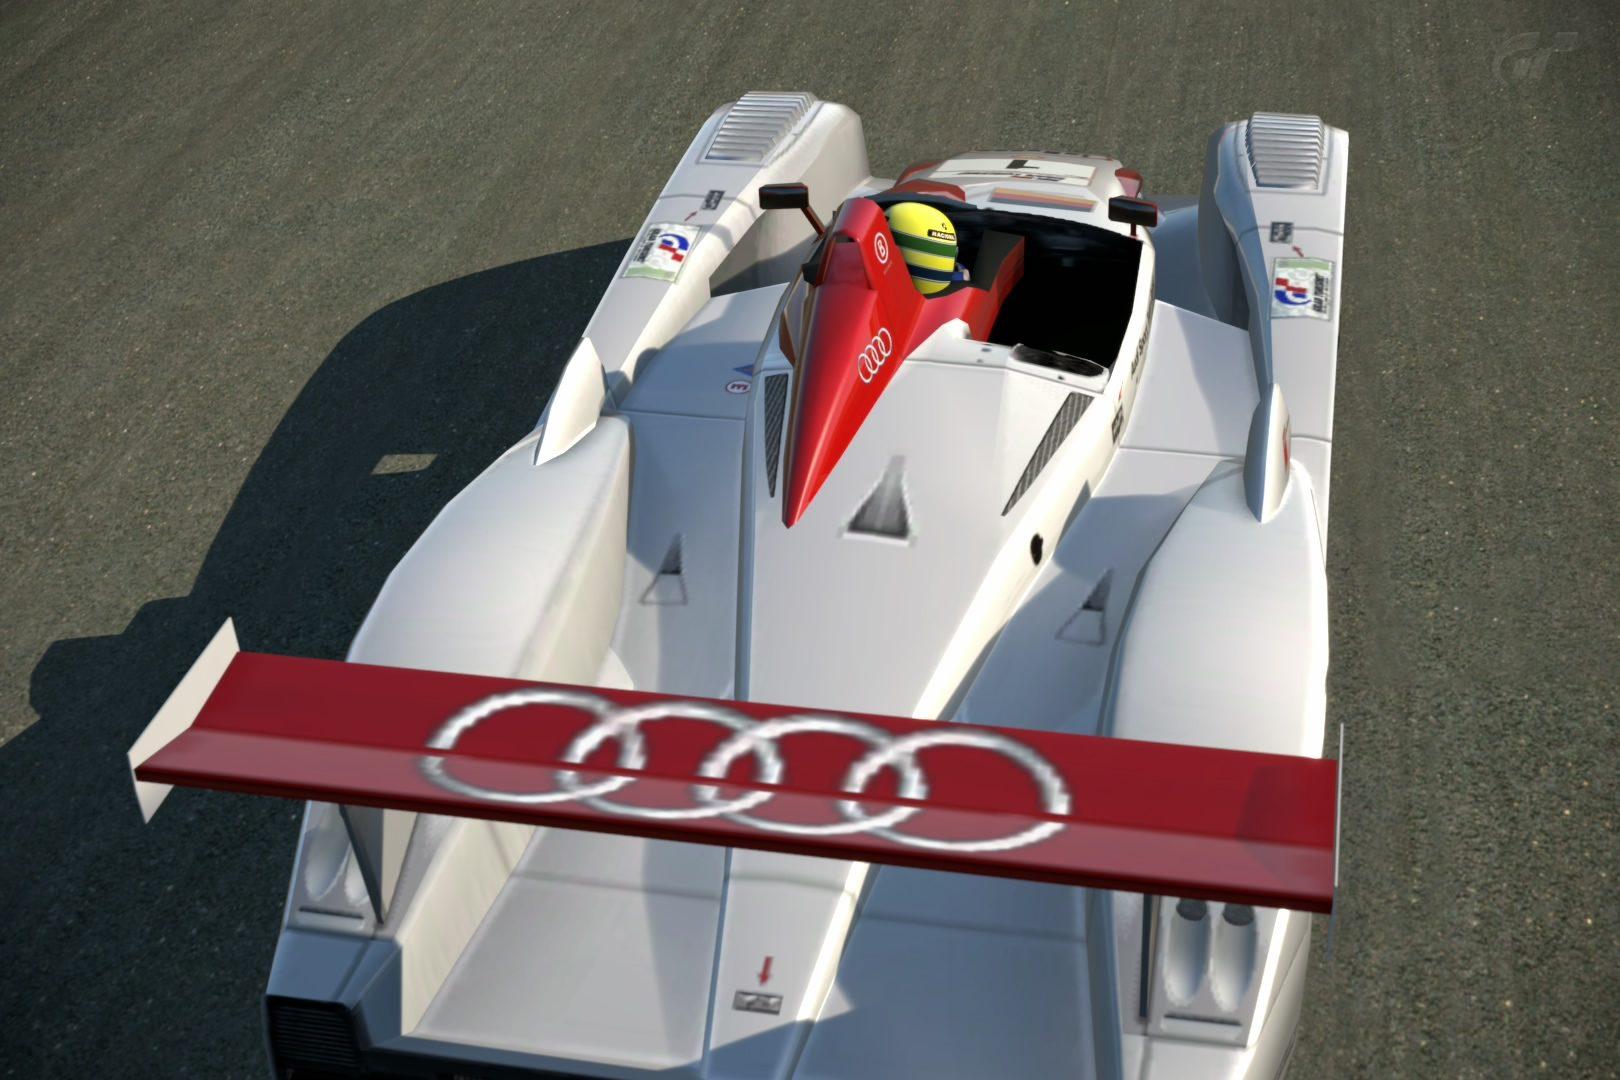 AudiR8RaceImg1.jpg